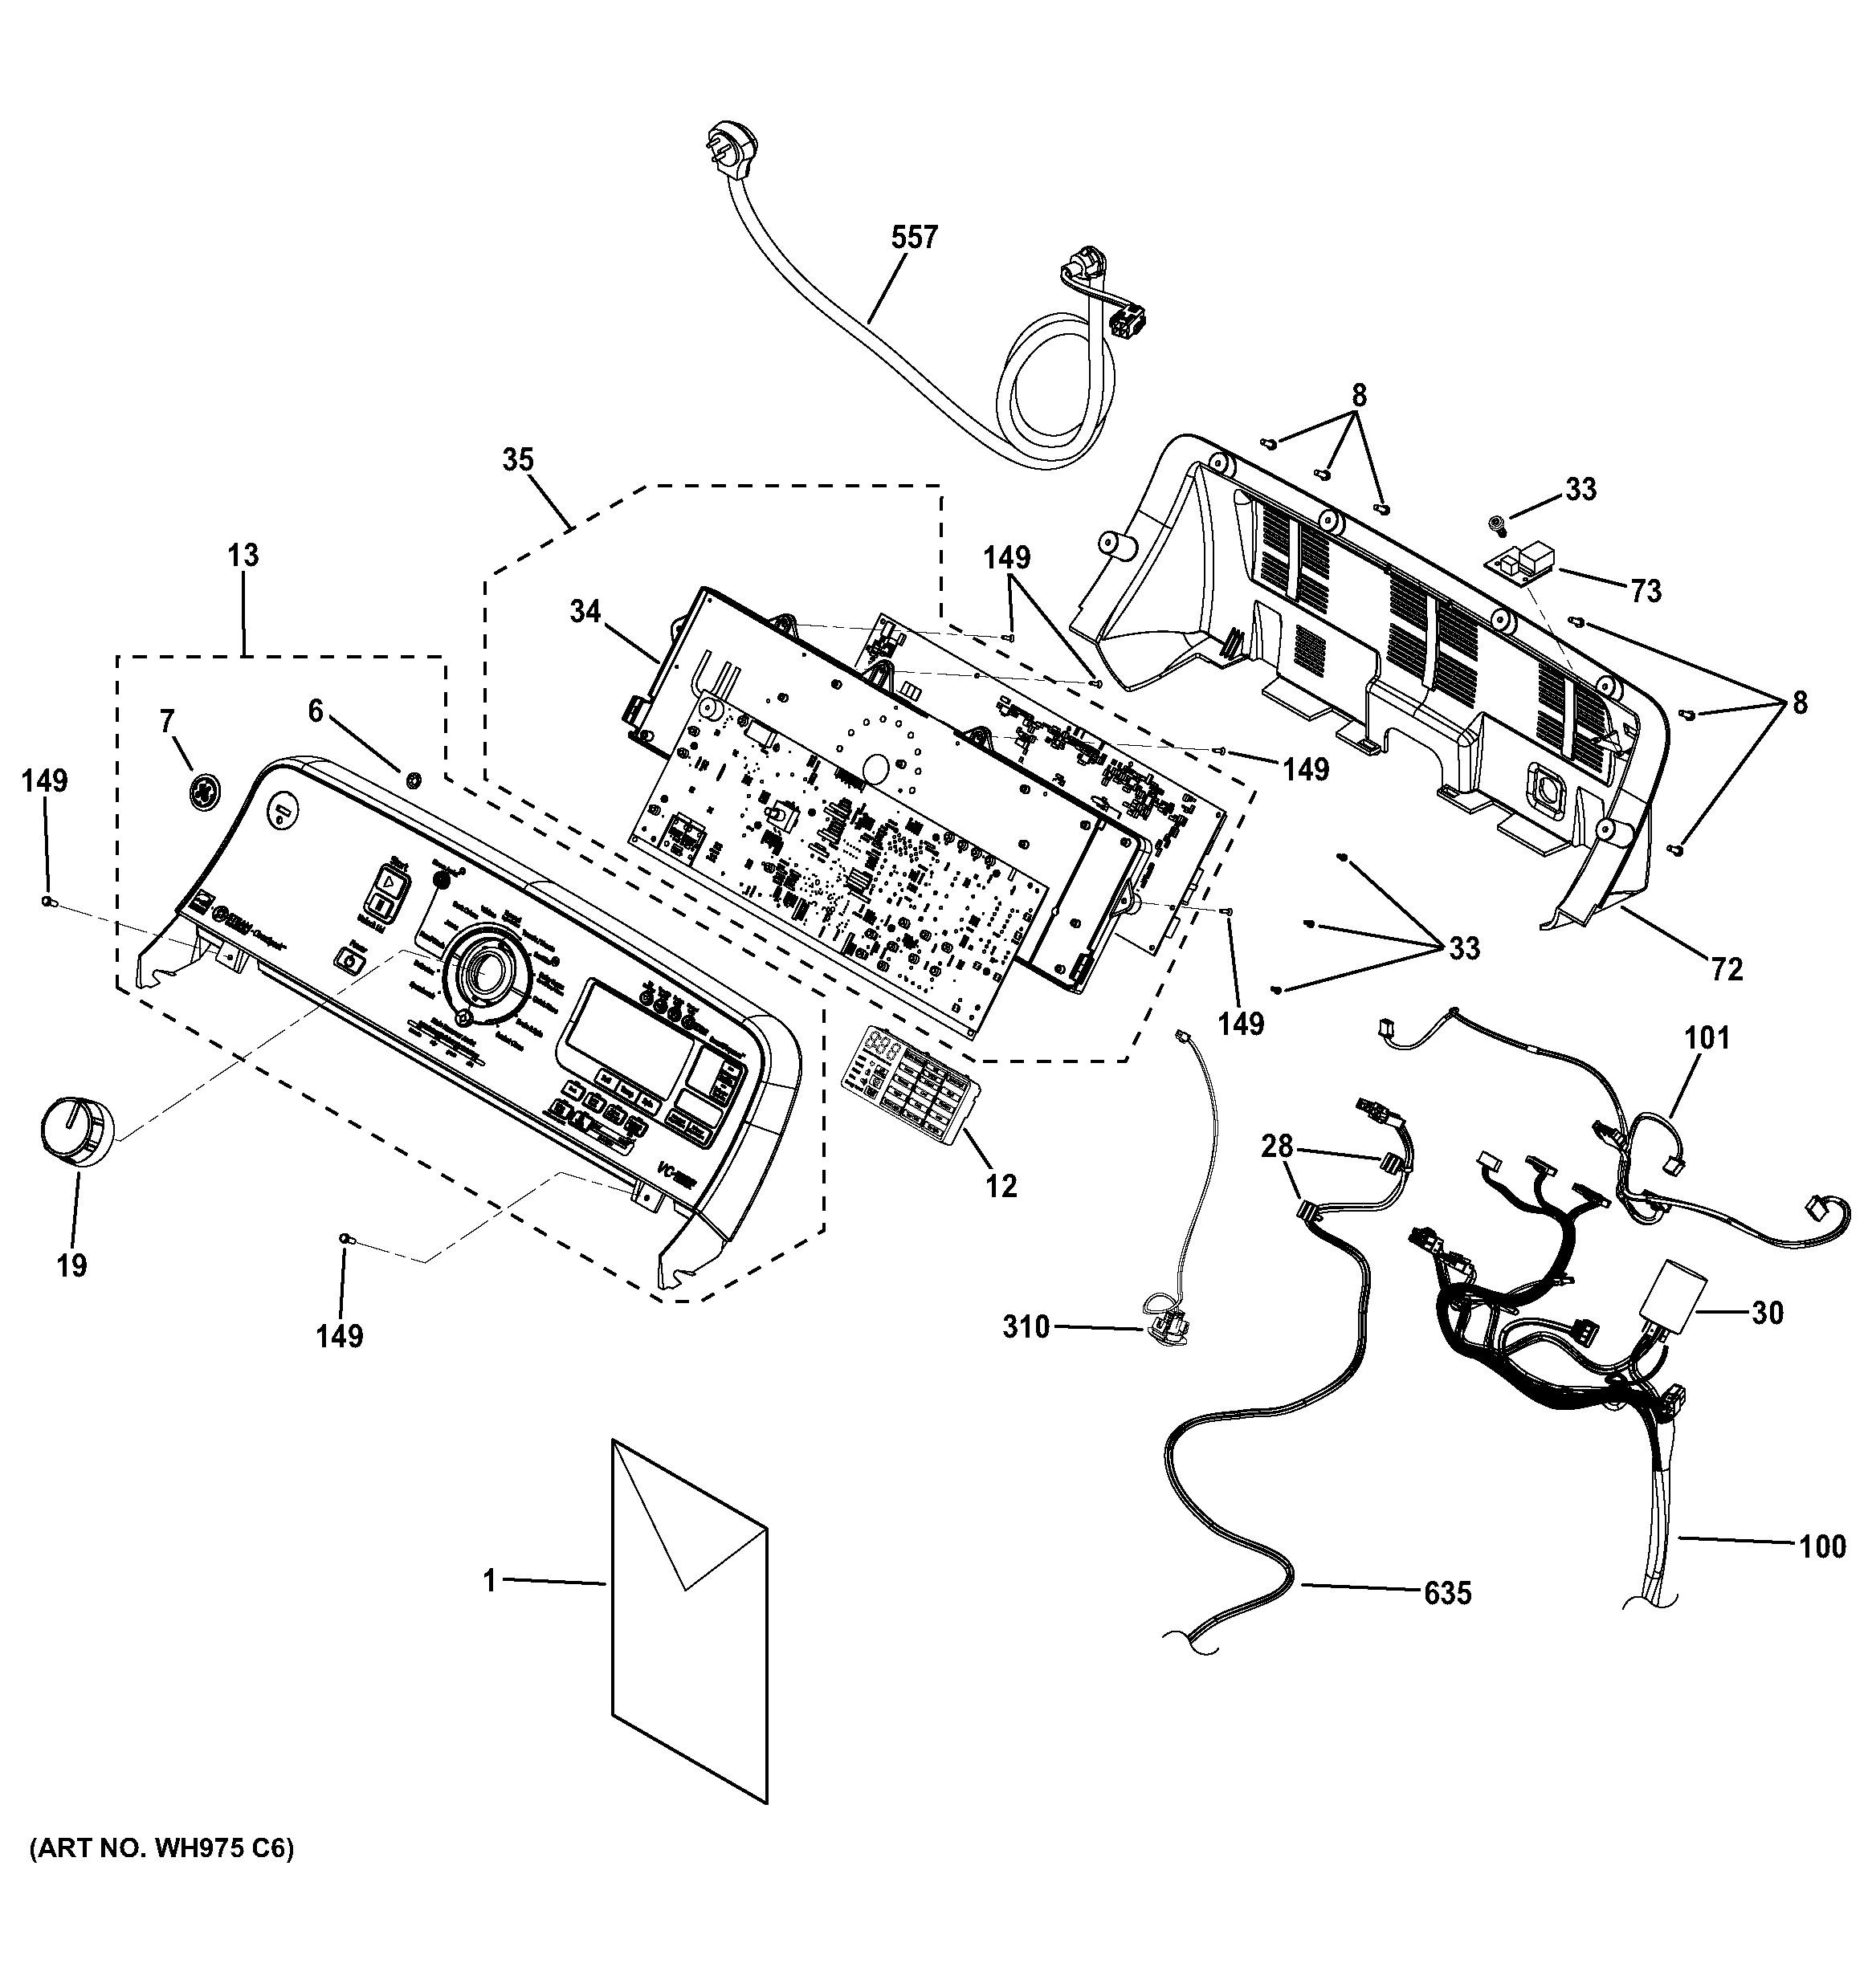 Auto Parts Diagram Ge Model Gtwn8250d0ws Residential Washers Genuine Parts Of Auto Parts Diagram